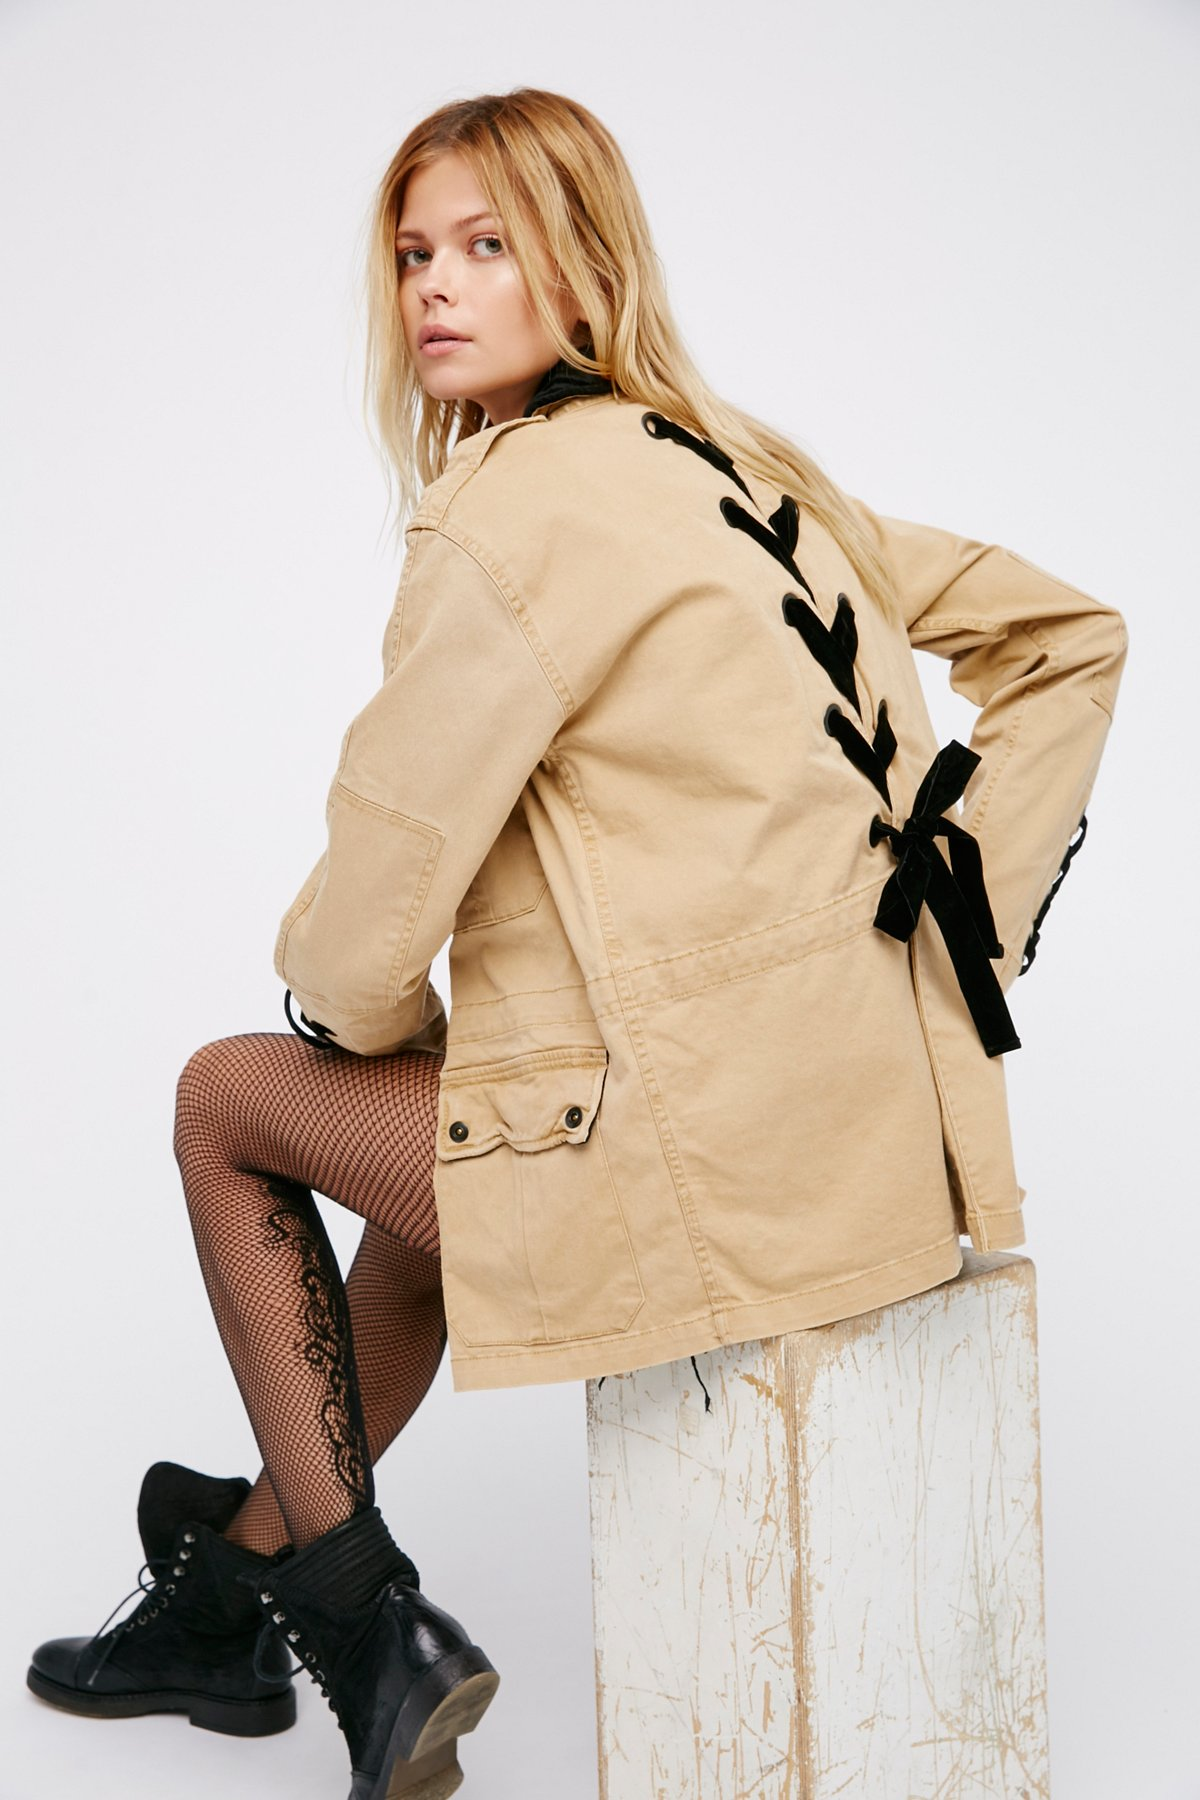 Velvet Lace Up Army Jacket